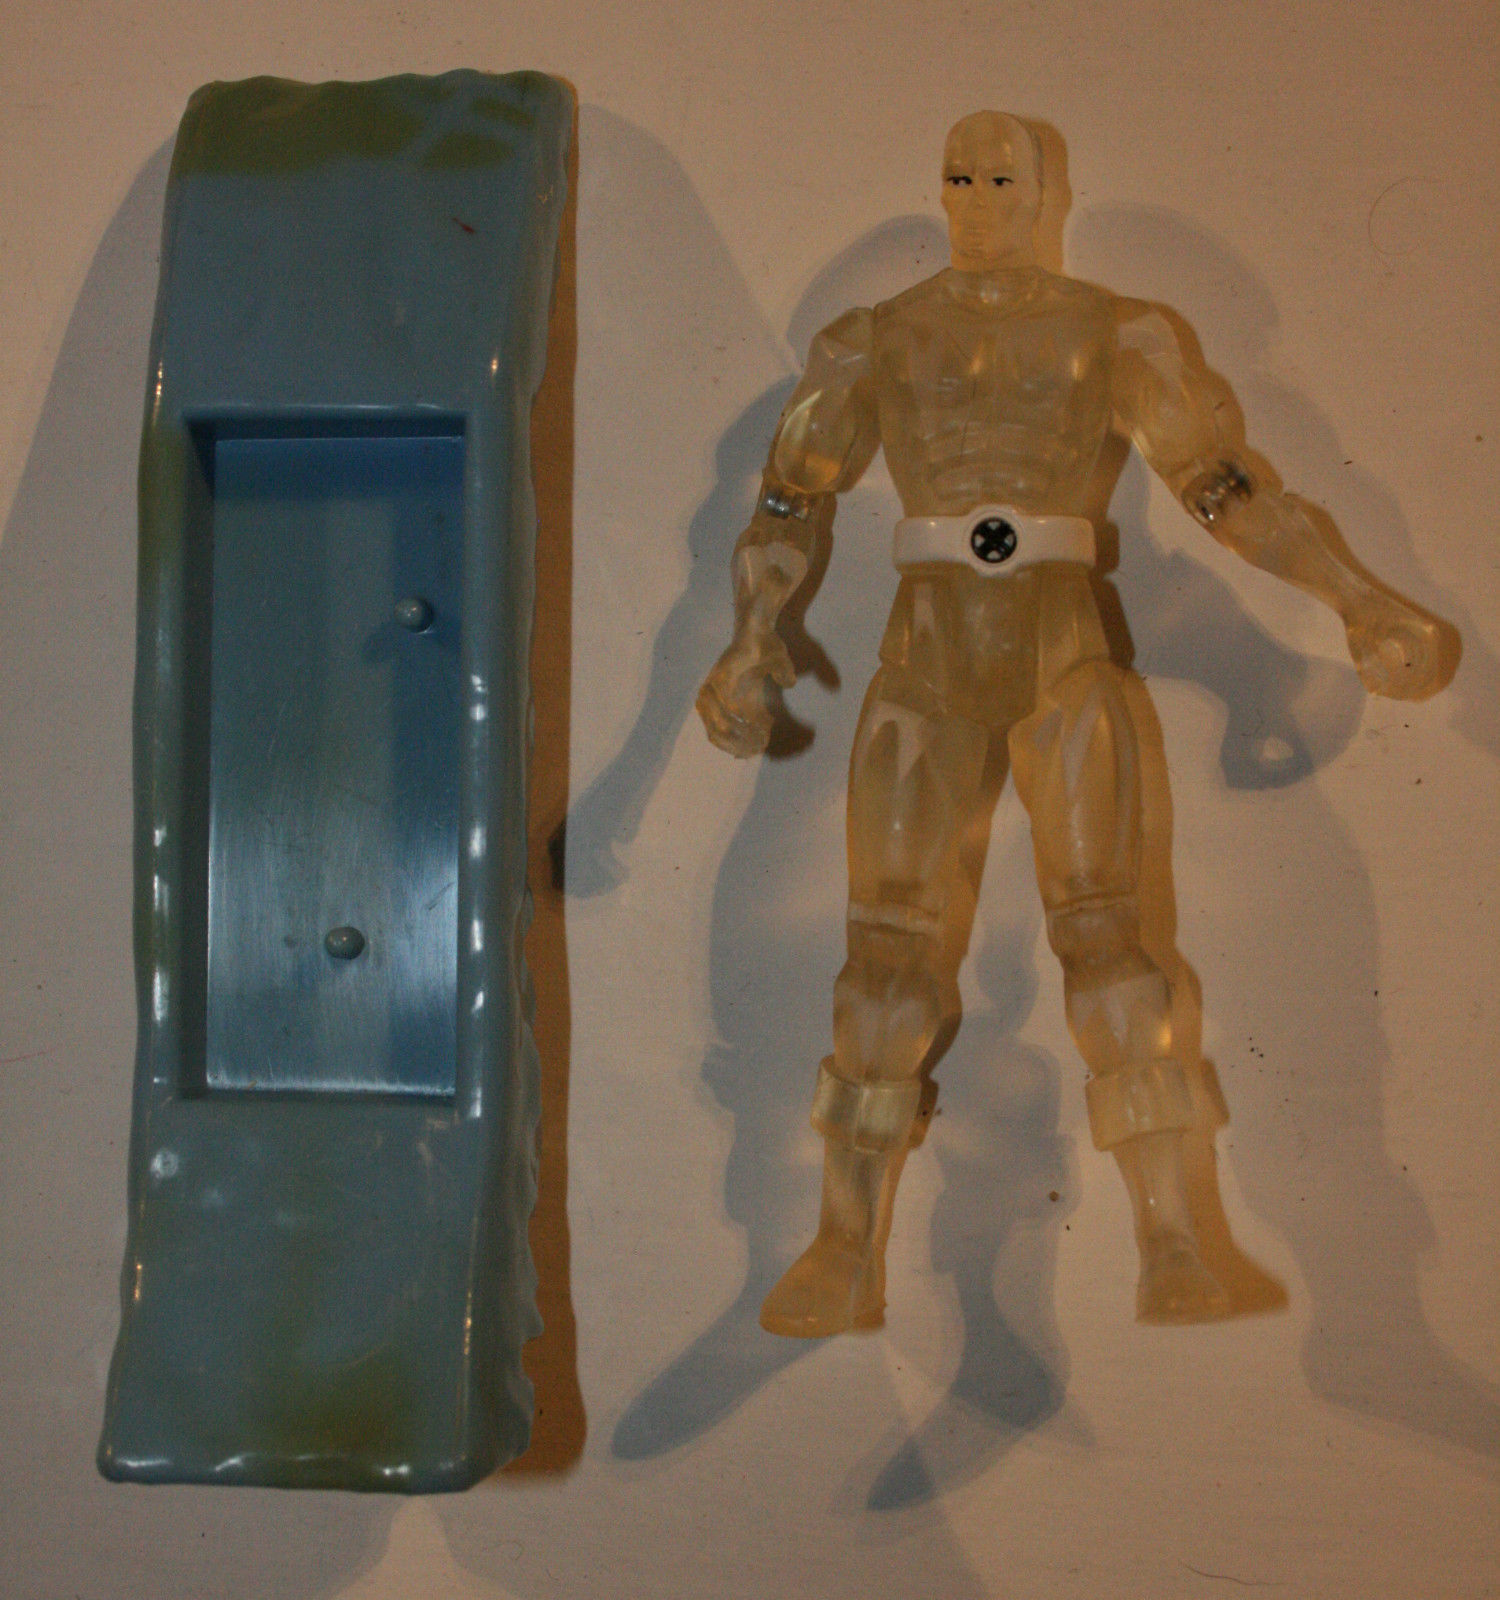 Toy Biz Spiderman Action Figure (1990s): 10 listings